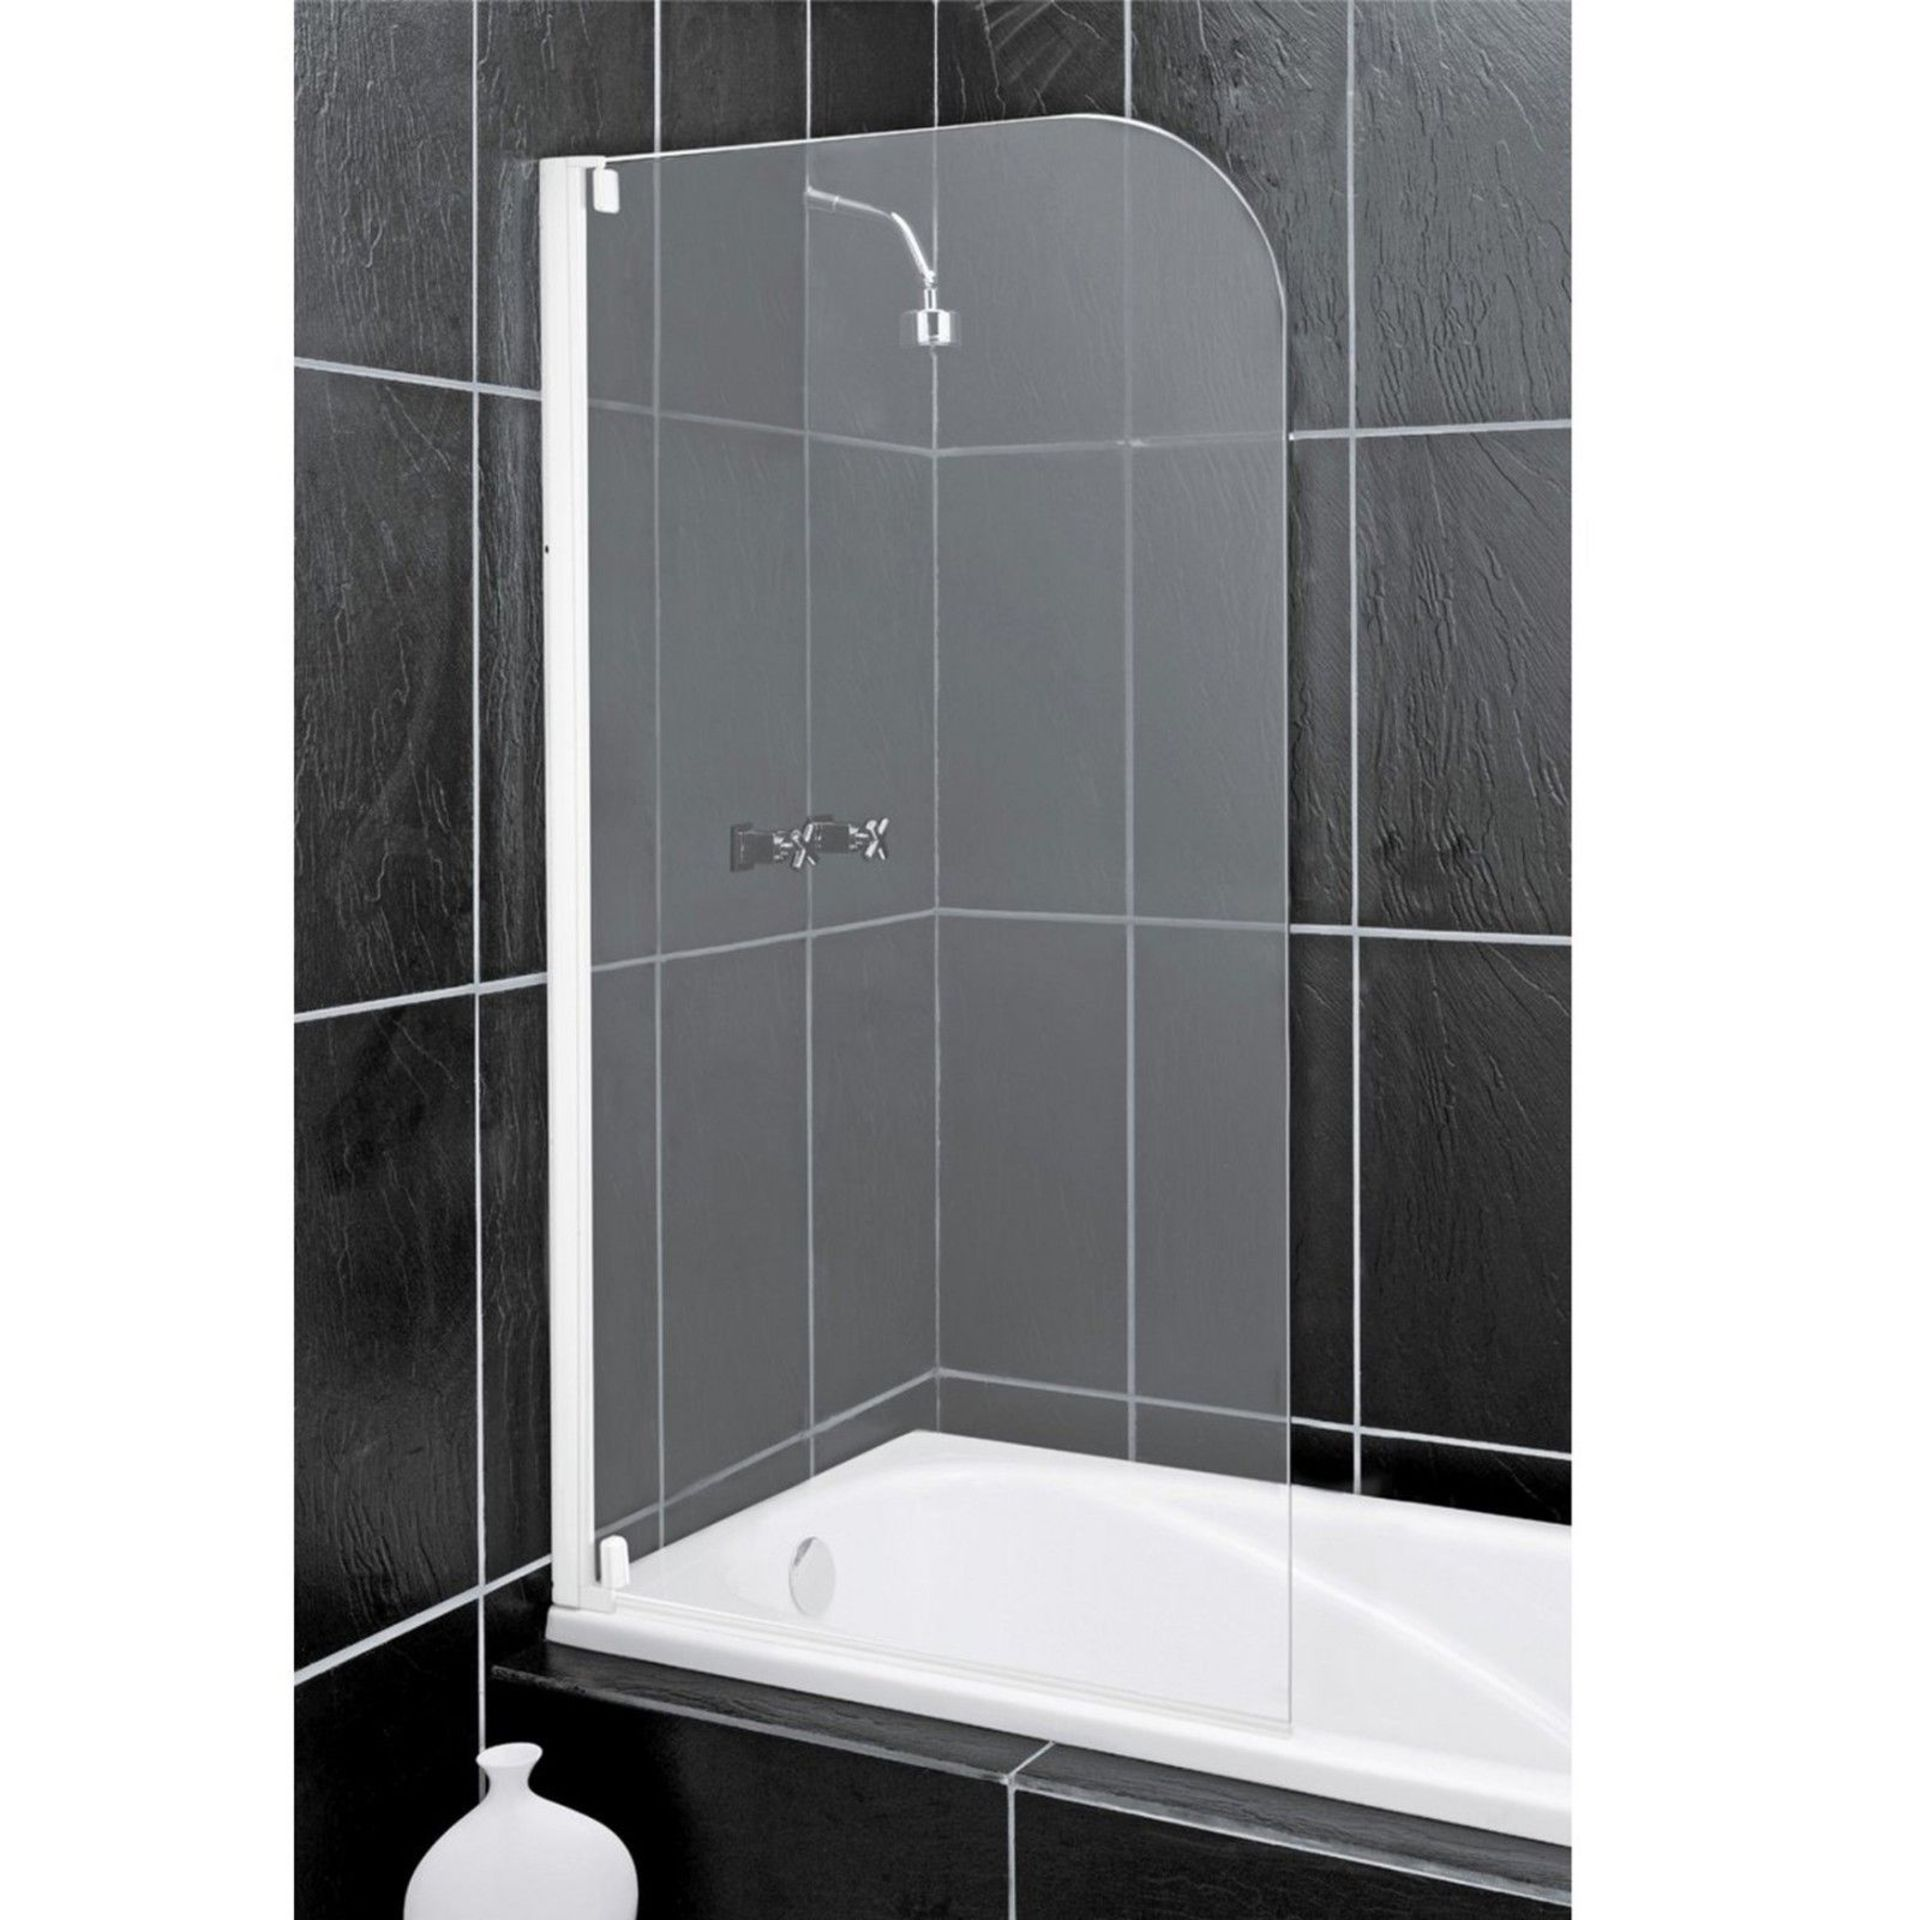 Lot 44 - (XX30) Half Framed 4mm Safety Glass White Radius Bath & Shower Screen Door Panel. This stylish ...